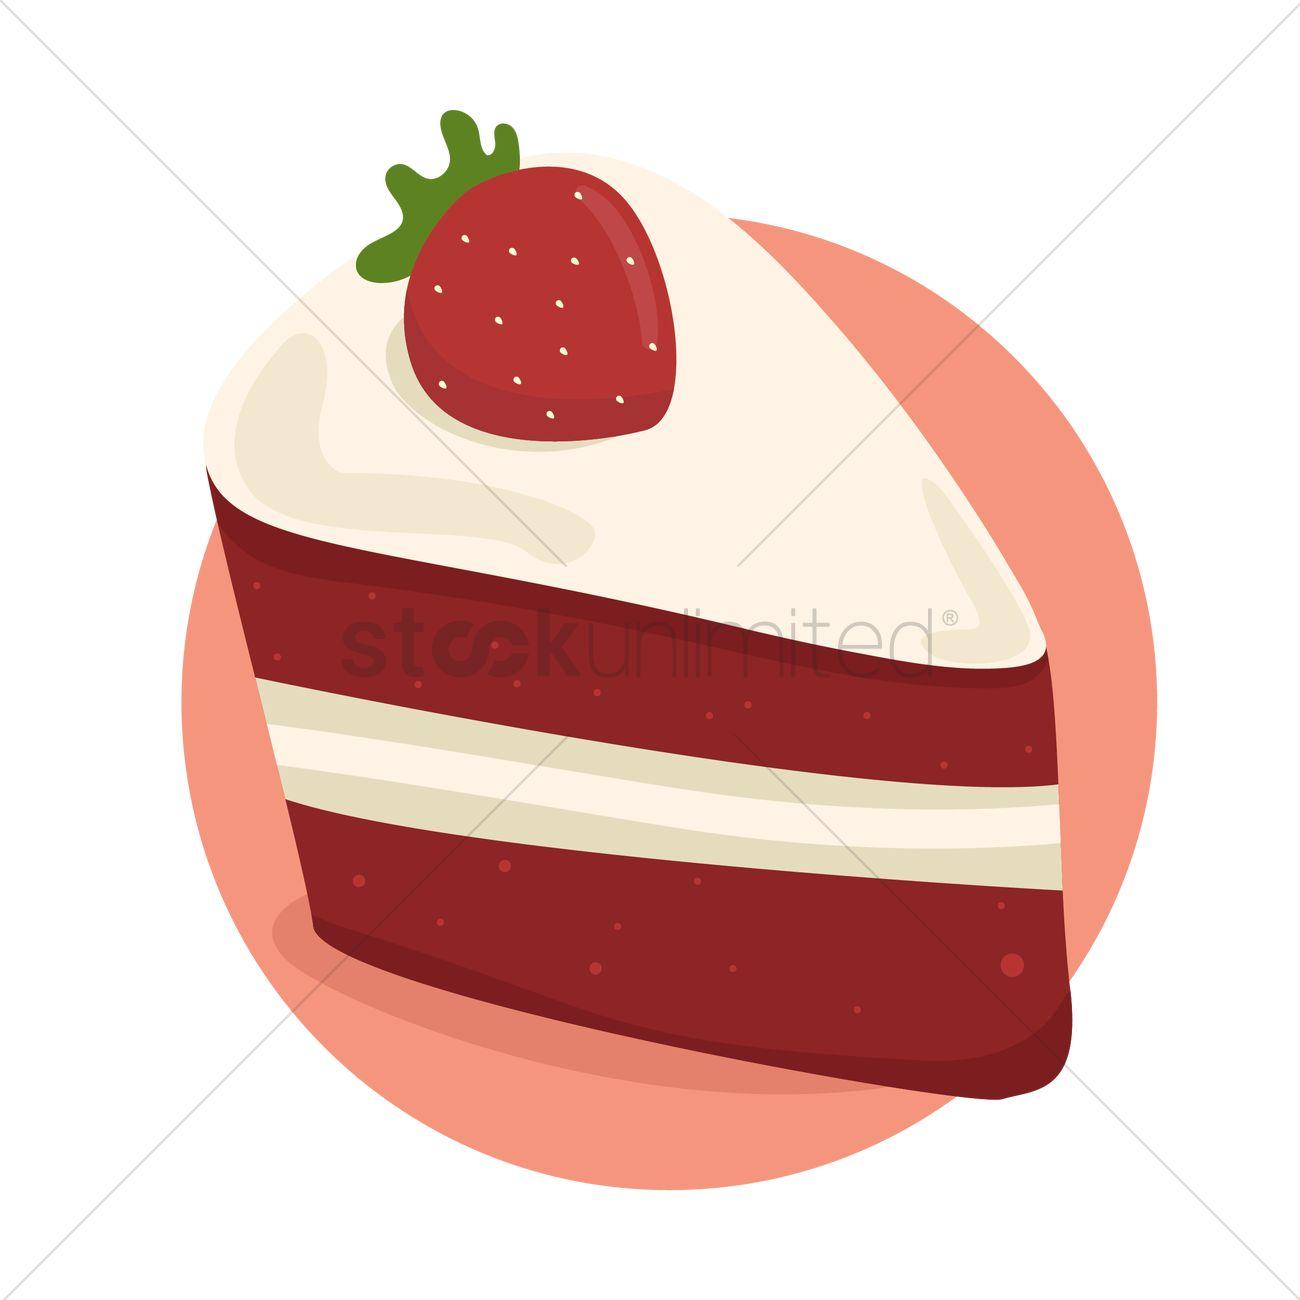 strawberry cake slice vector image 1524234 stockunlimited rh stockunlimited com slice of cake clipart slice of chocolate cake clipart